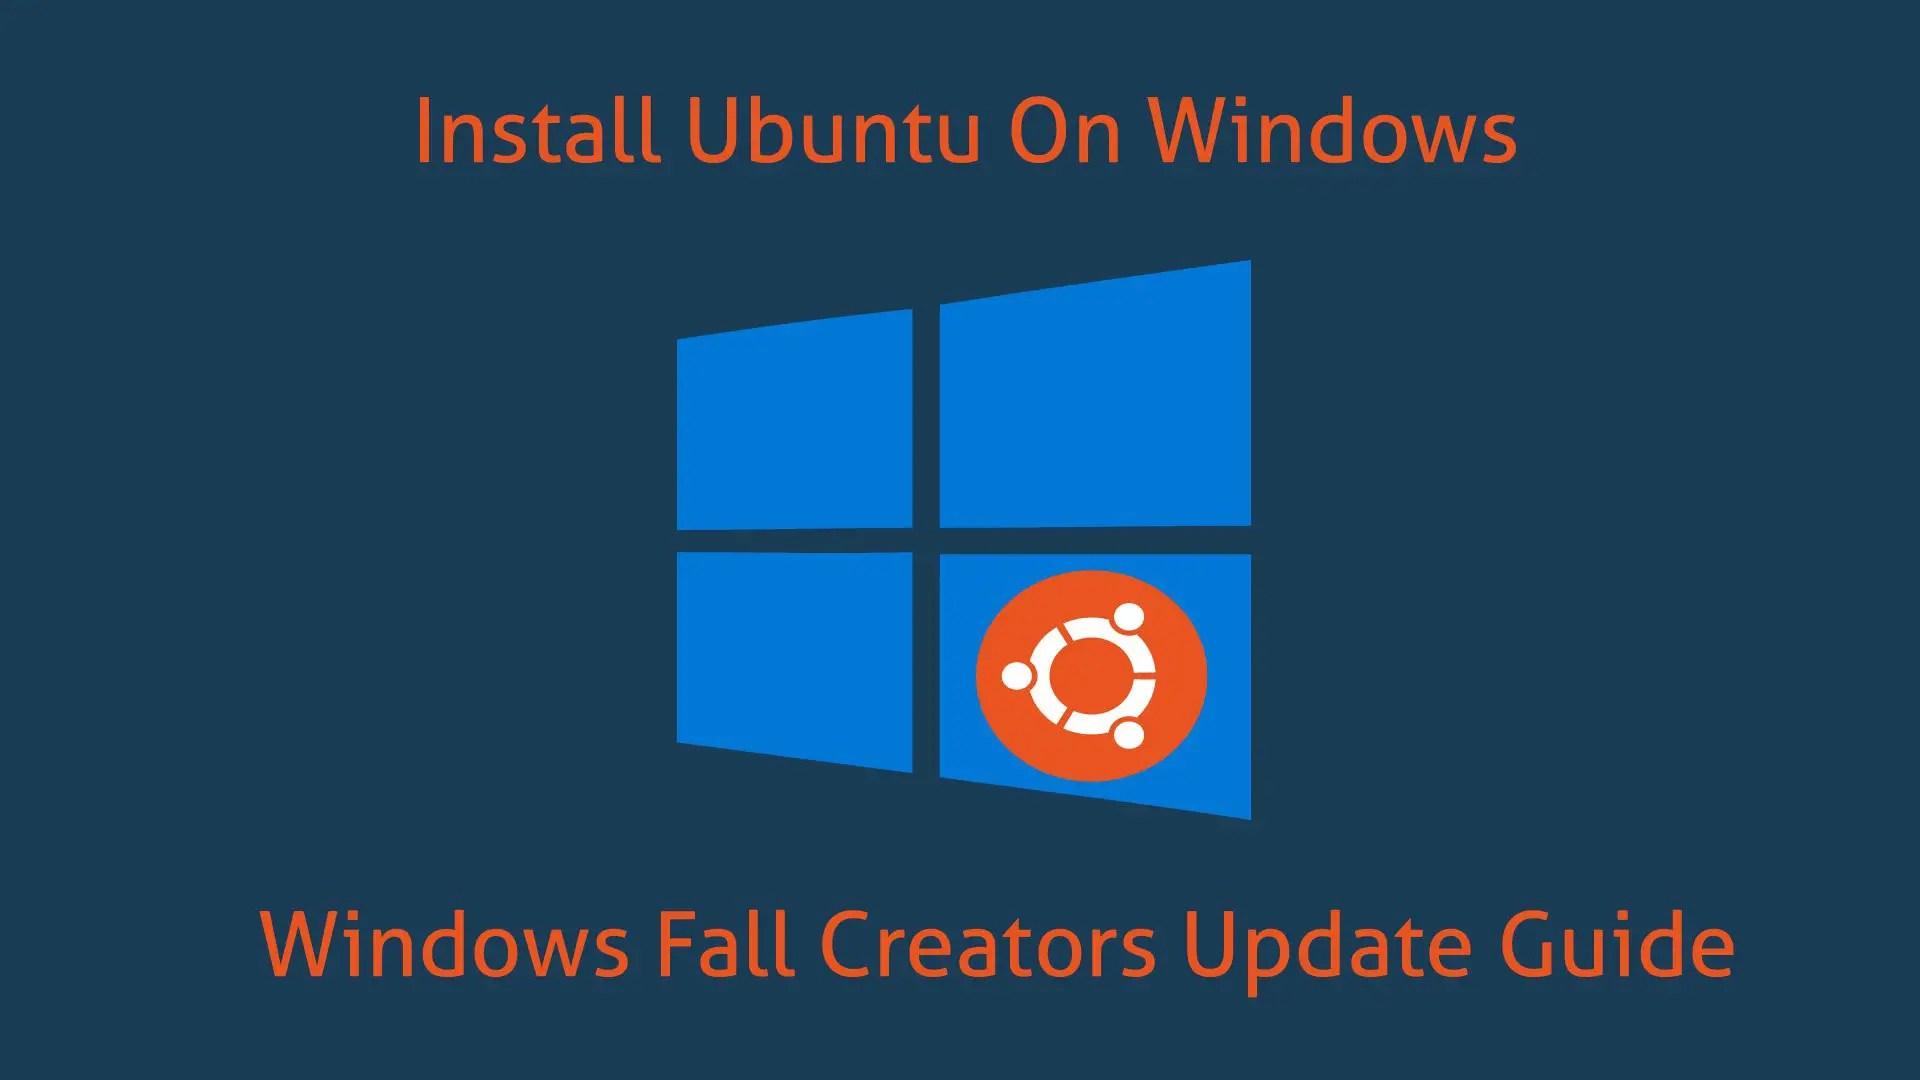 Install Ubuntu On Windows 10 : Windows Fall Creators Update Guide 2018